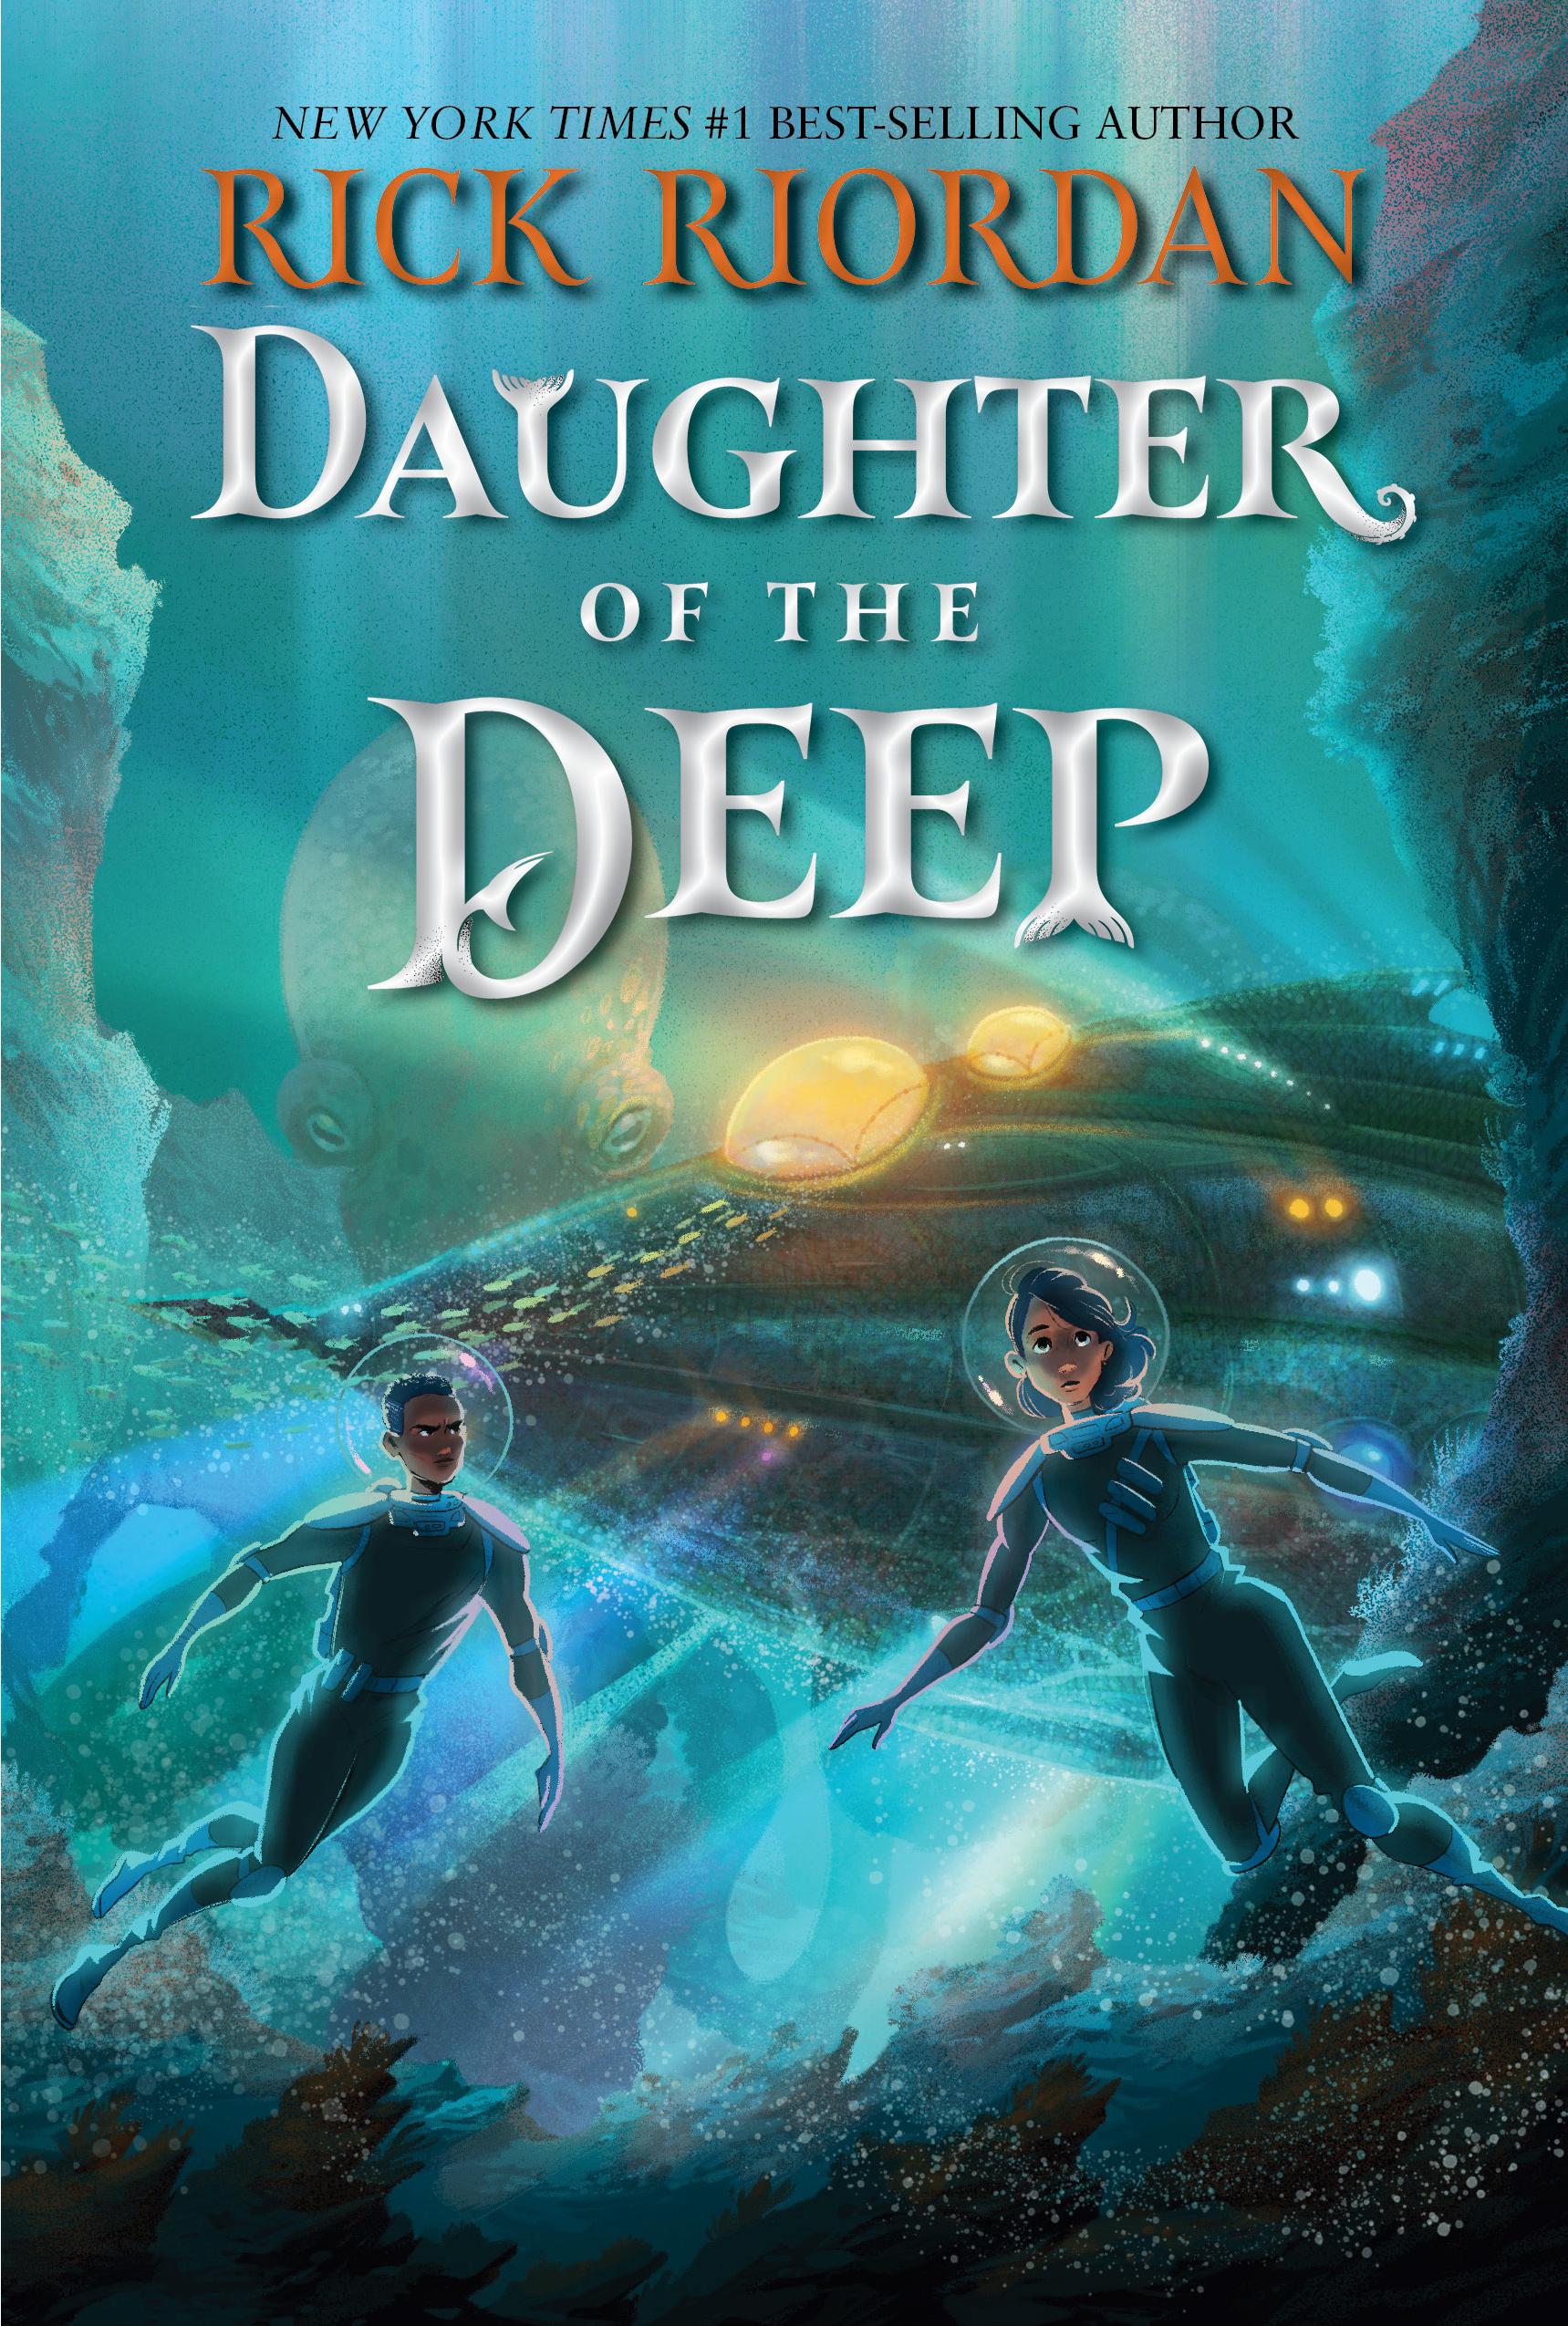 Read an Excerpt from Rick Riordan's DAUGHTER OF THE DEEP